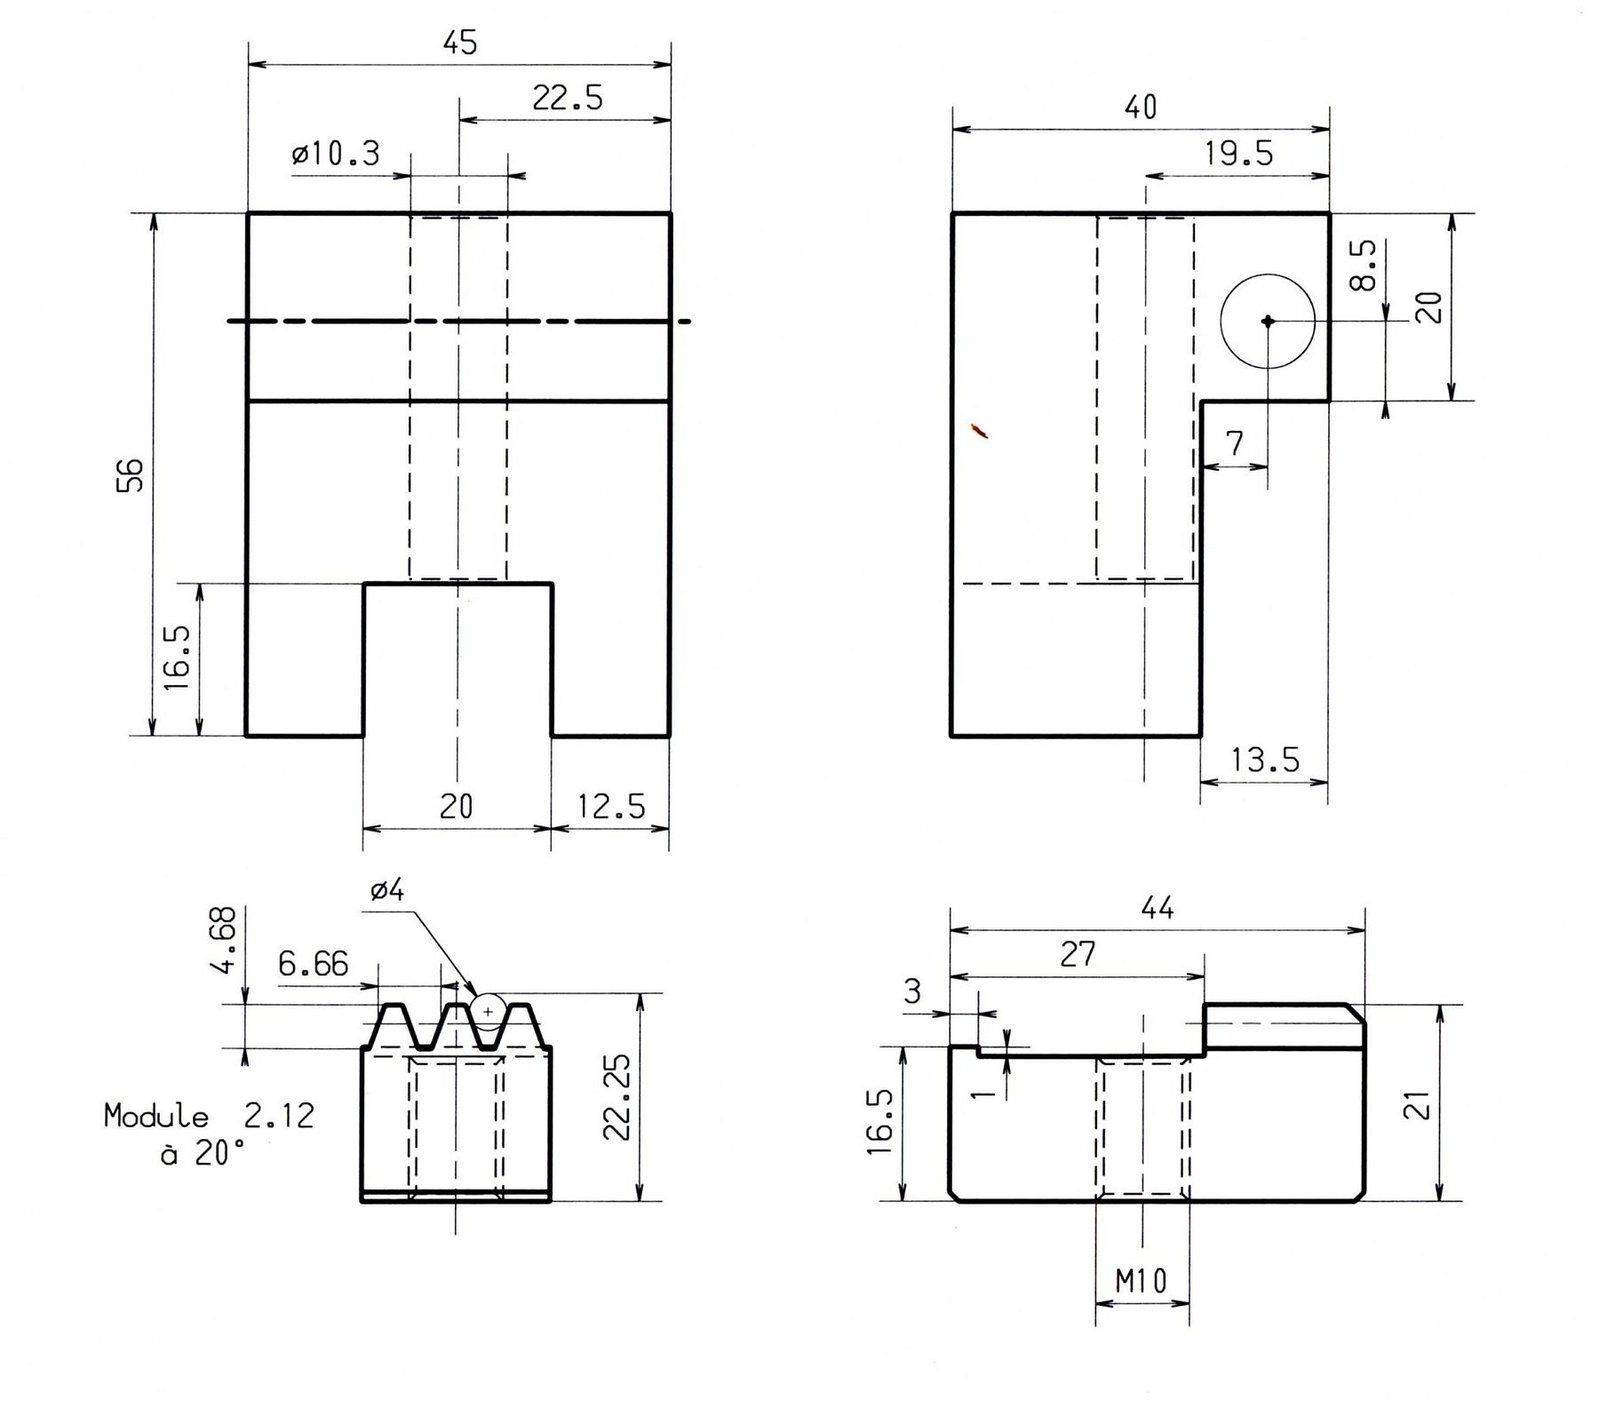 plan_but_caz [].jpg